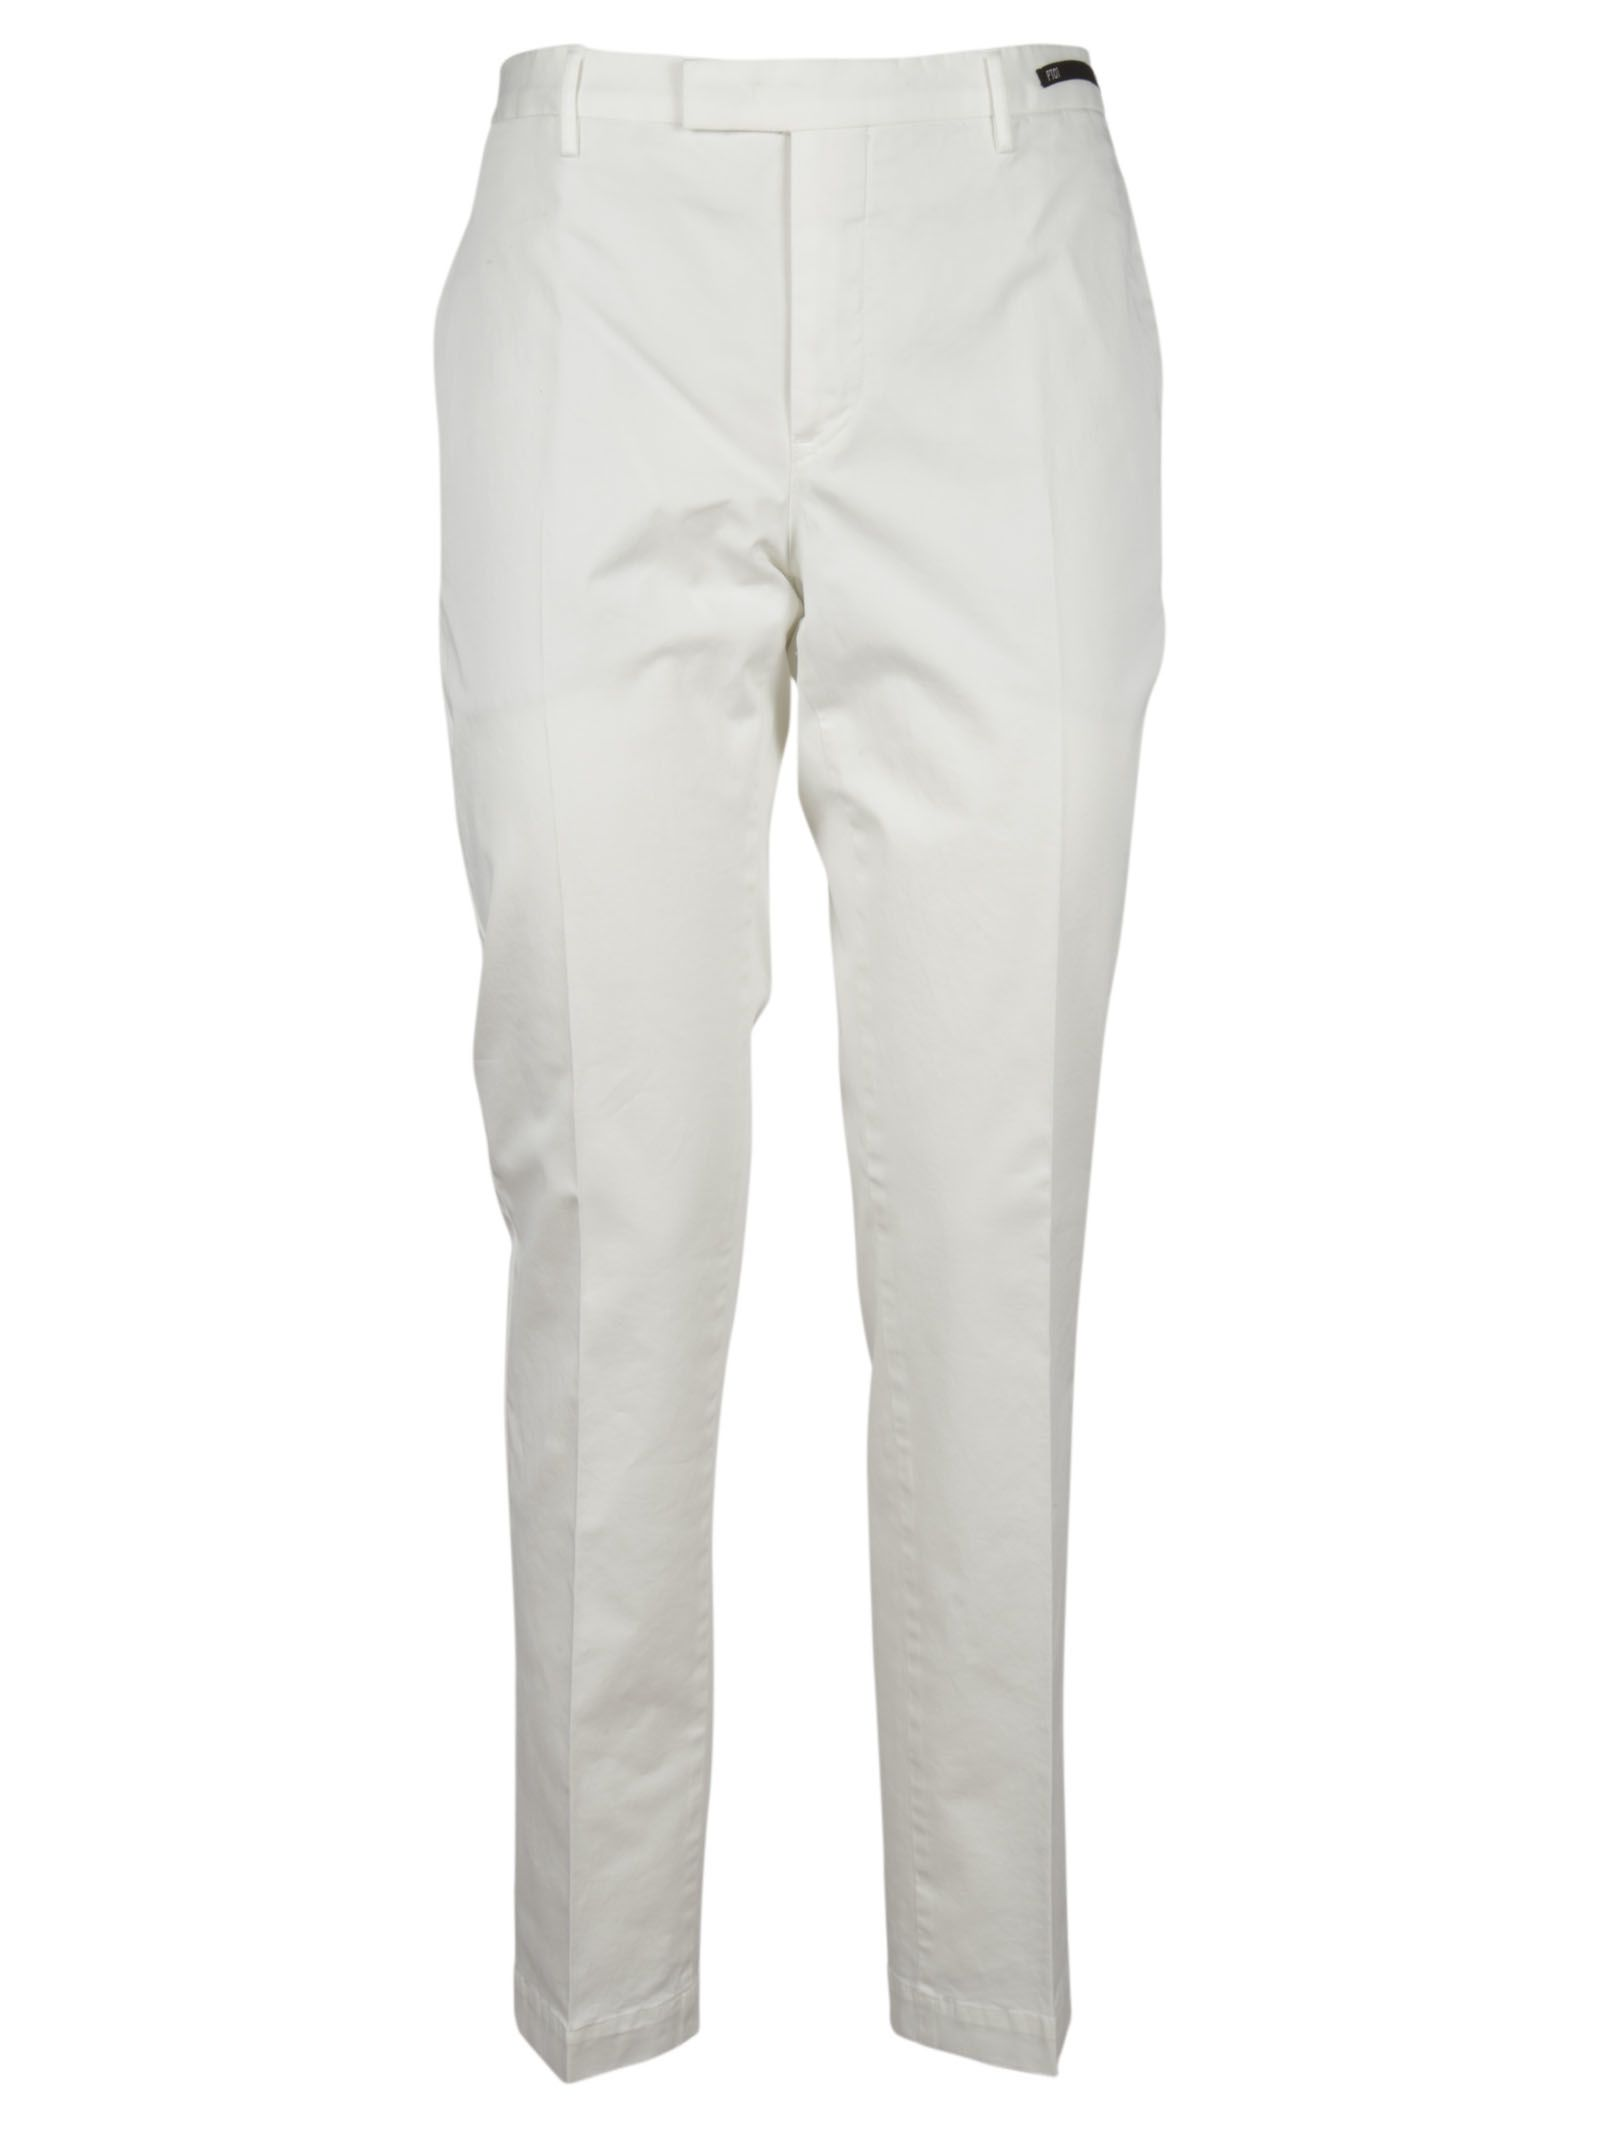 classic trousers - White PT01 9yHYlZeLO3